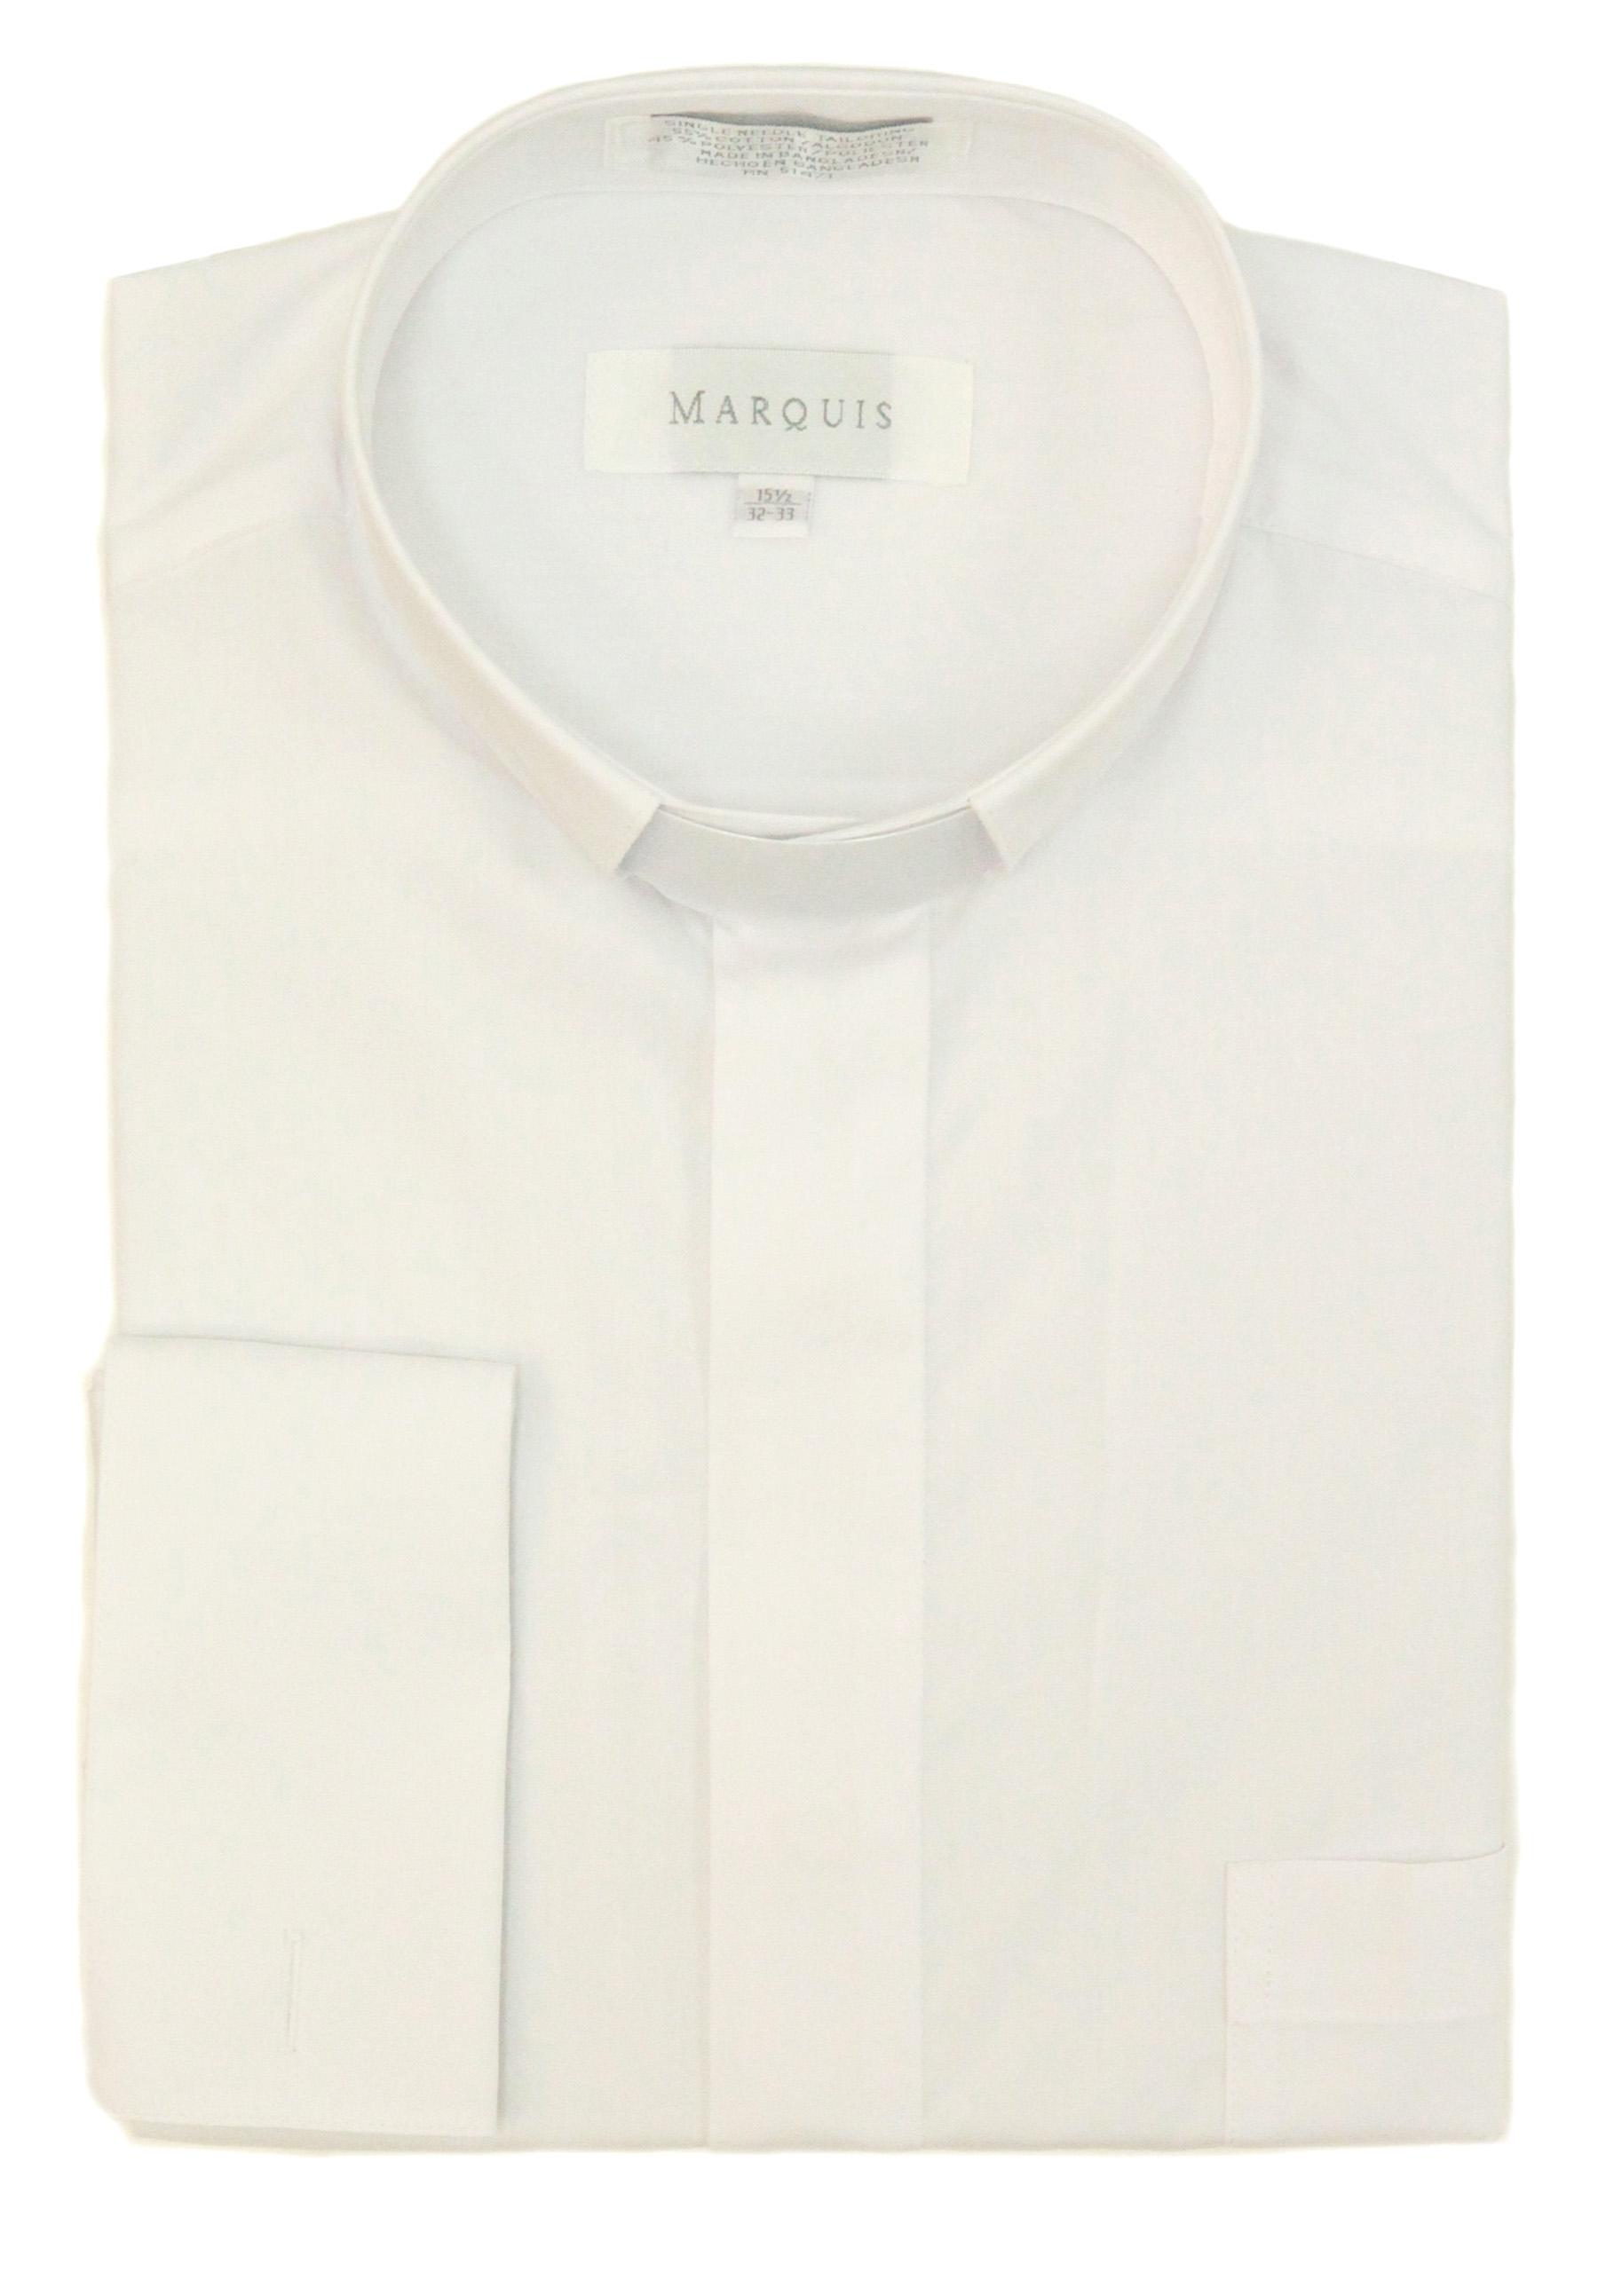 1003 - White